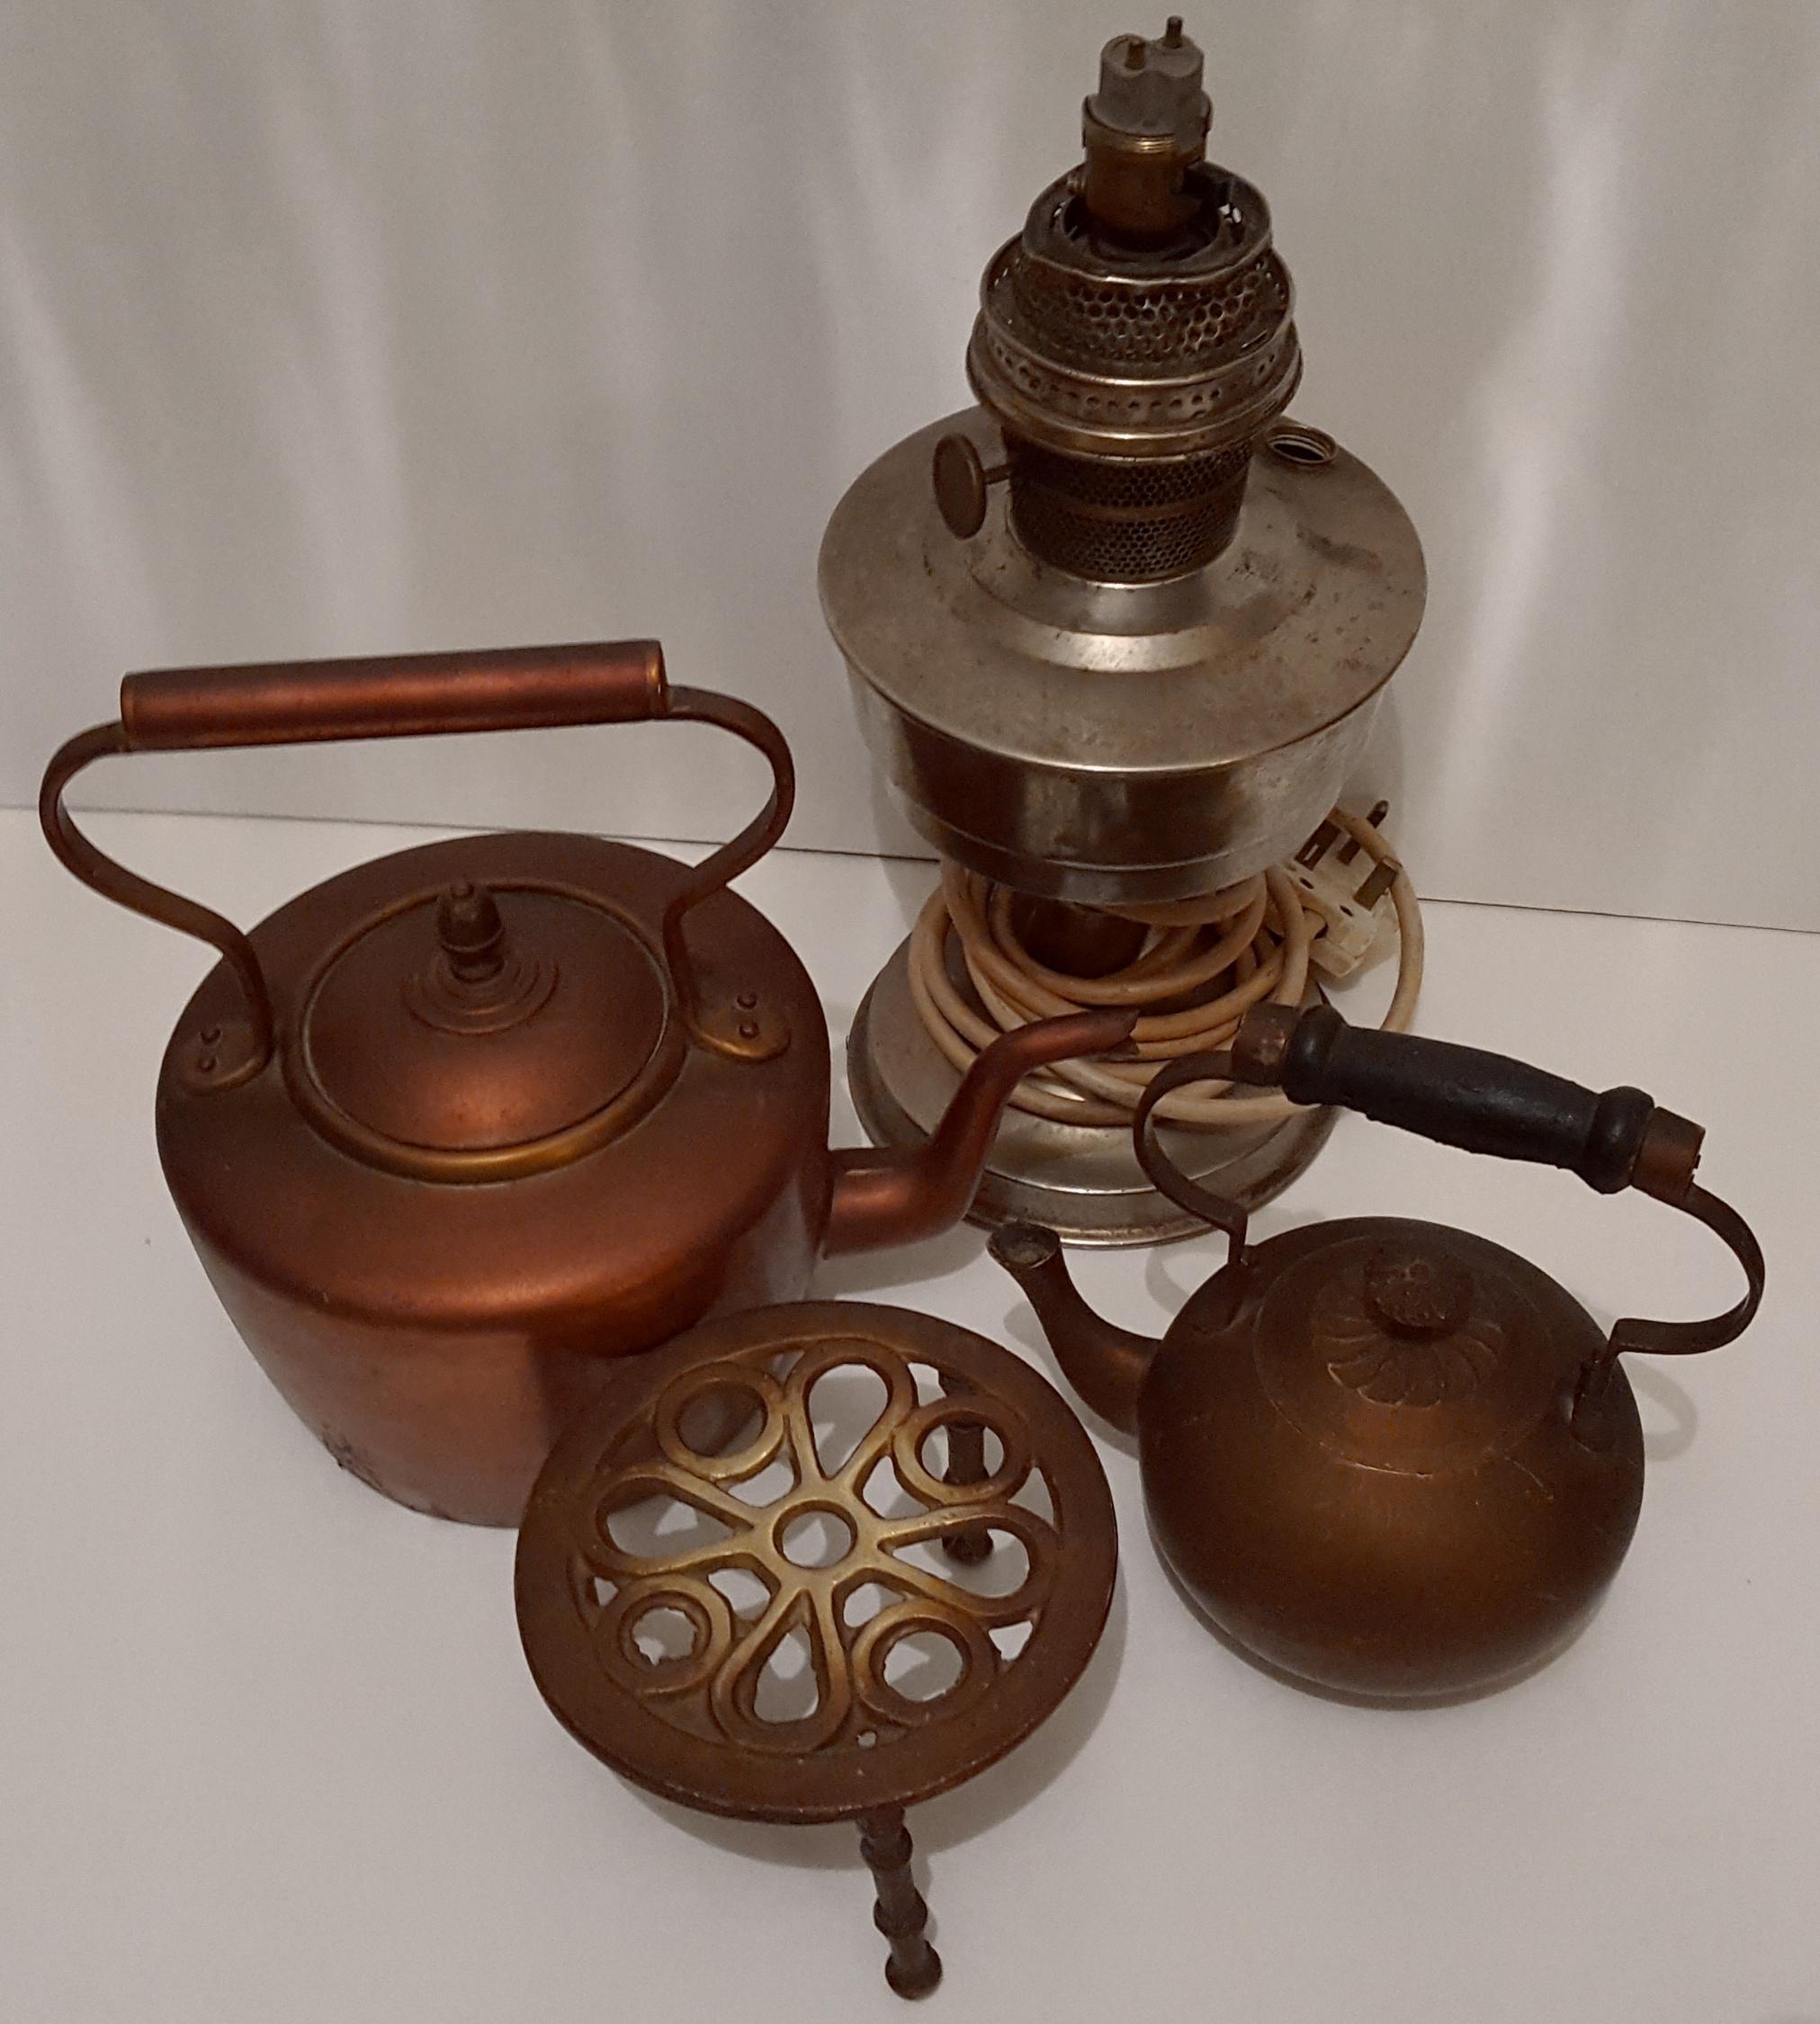 Lot 62 - Vintage Retro Brass & Copper Ware Includes Brass Tea Pot Copper Kettle NO RESERVE